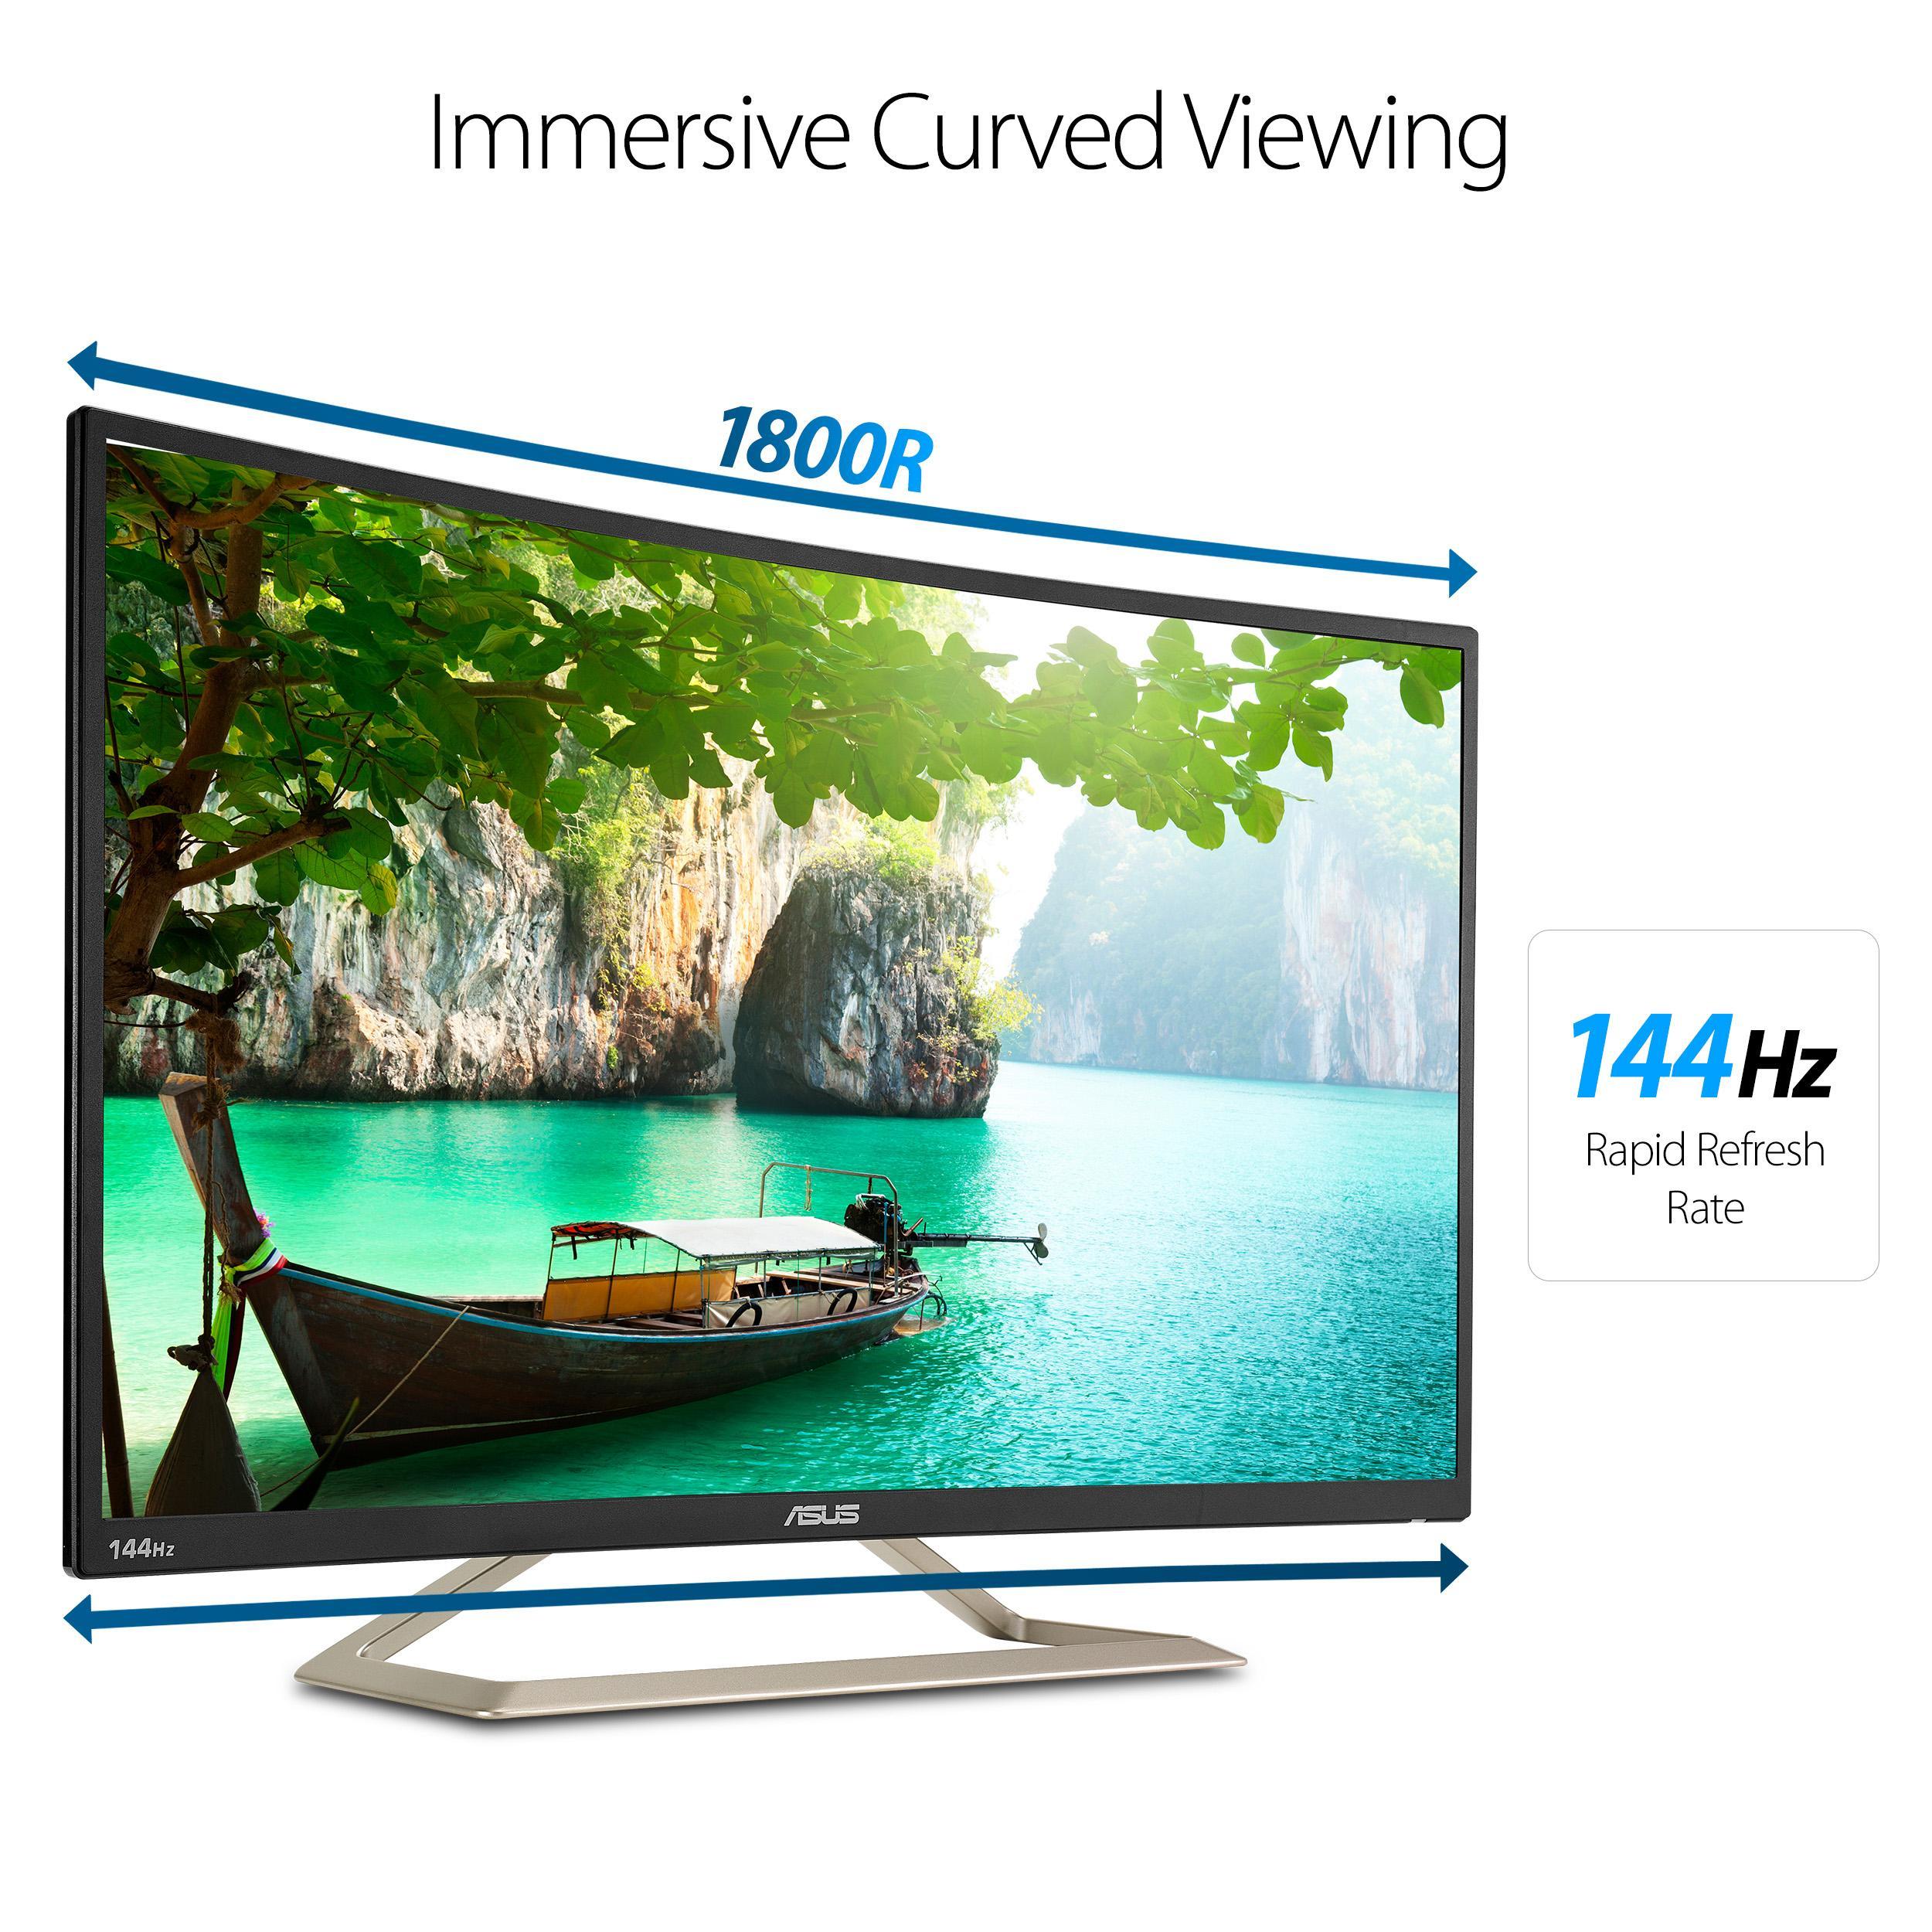 "ASUS Curved VA326H 31 5"" Full HD 1080p 144Hz HDMI VGA DVI Eye Care Monitor"